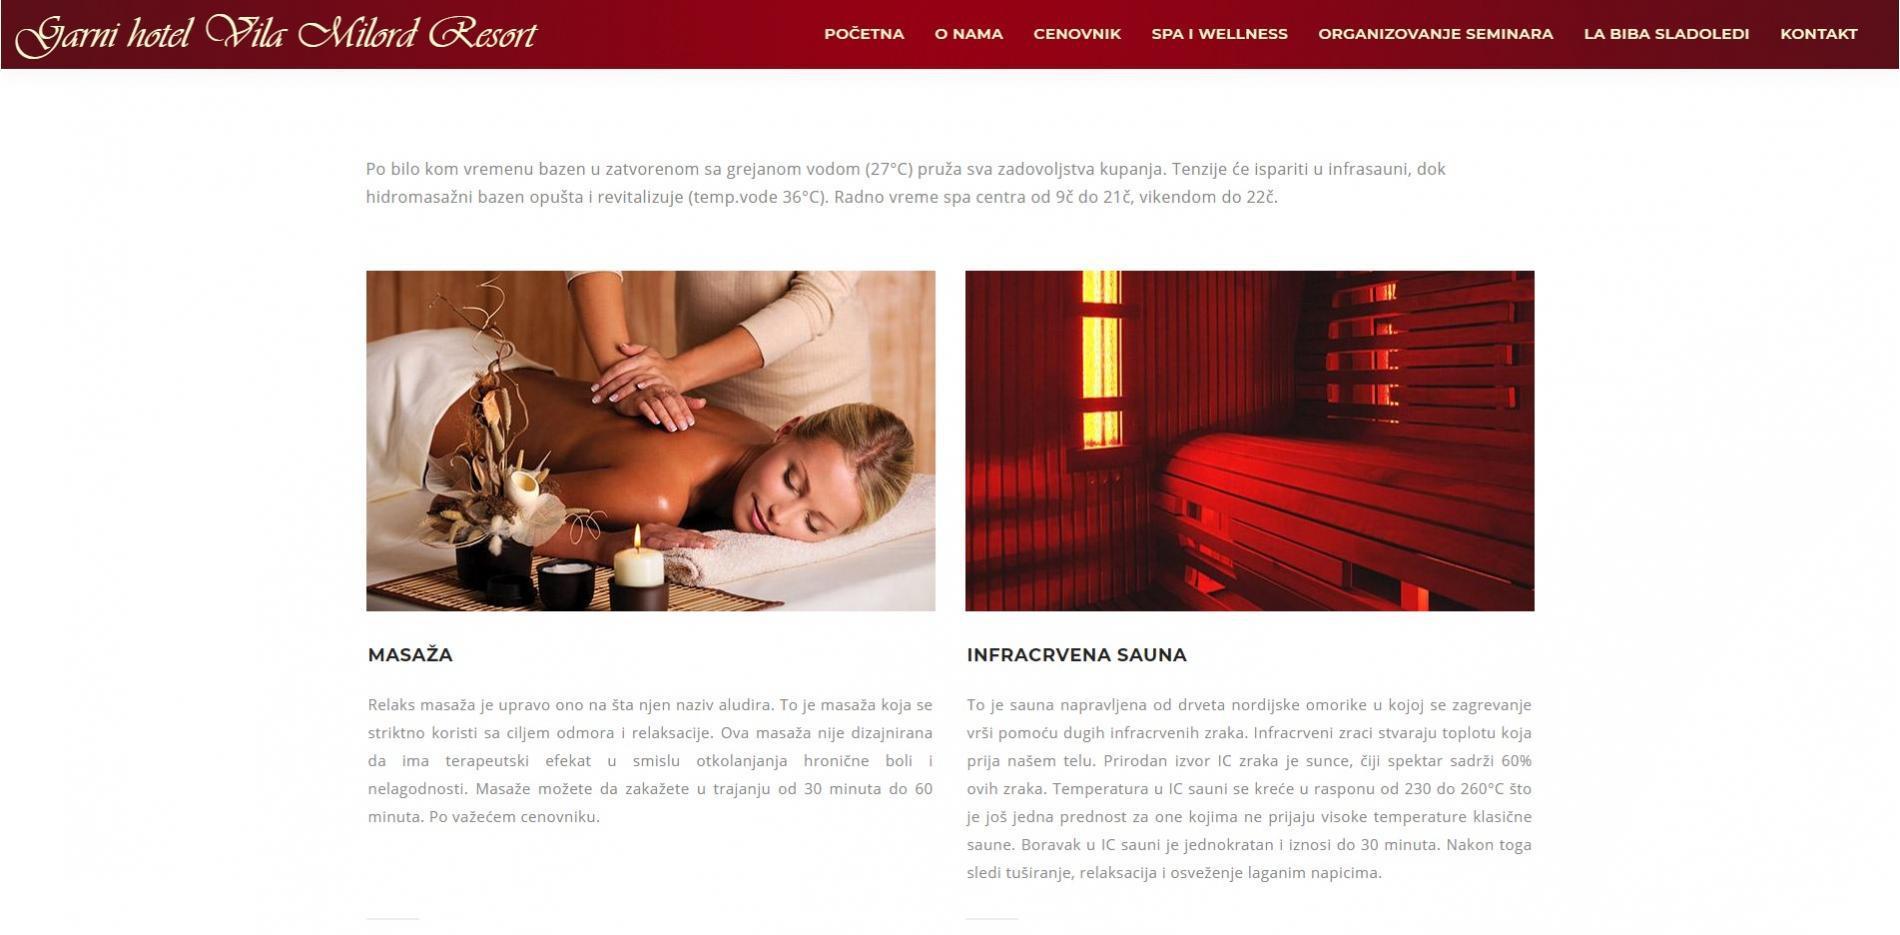 Garni hotel Vila Milord Resort